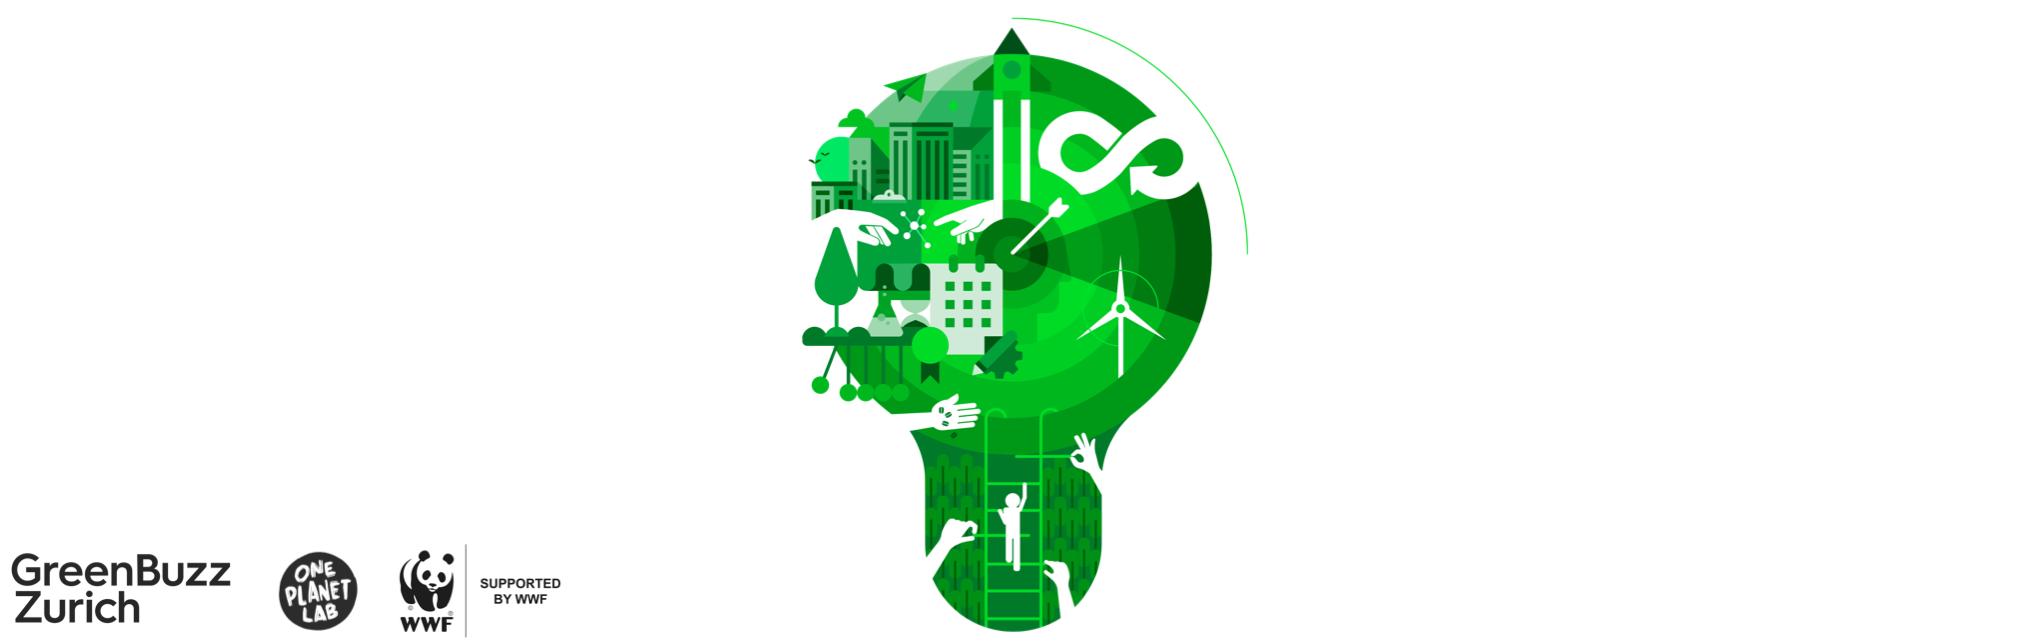 The GreenBusiness Challenge